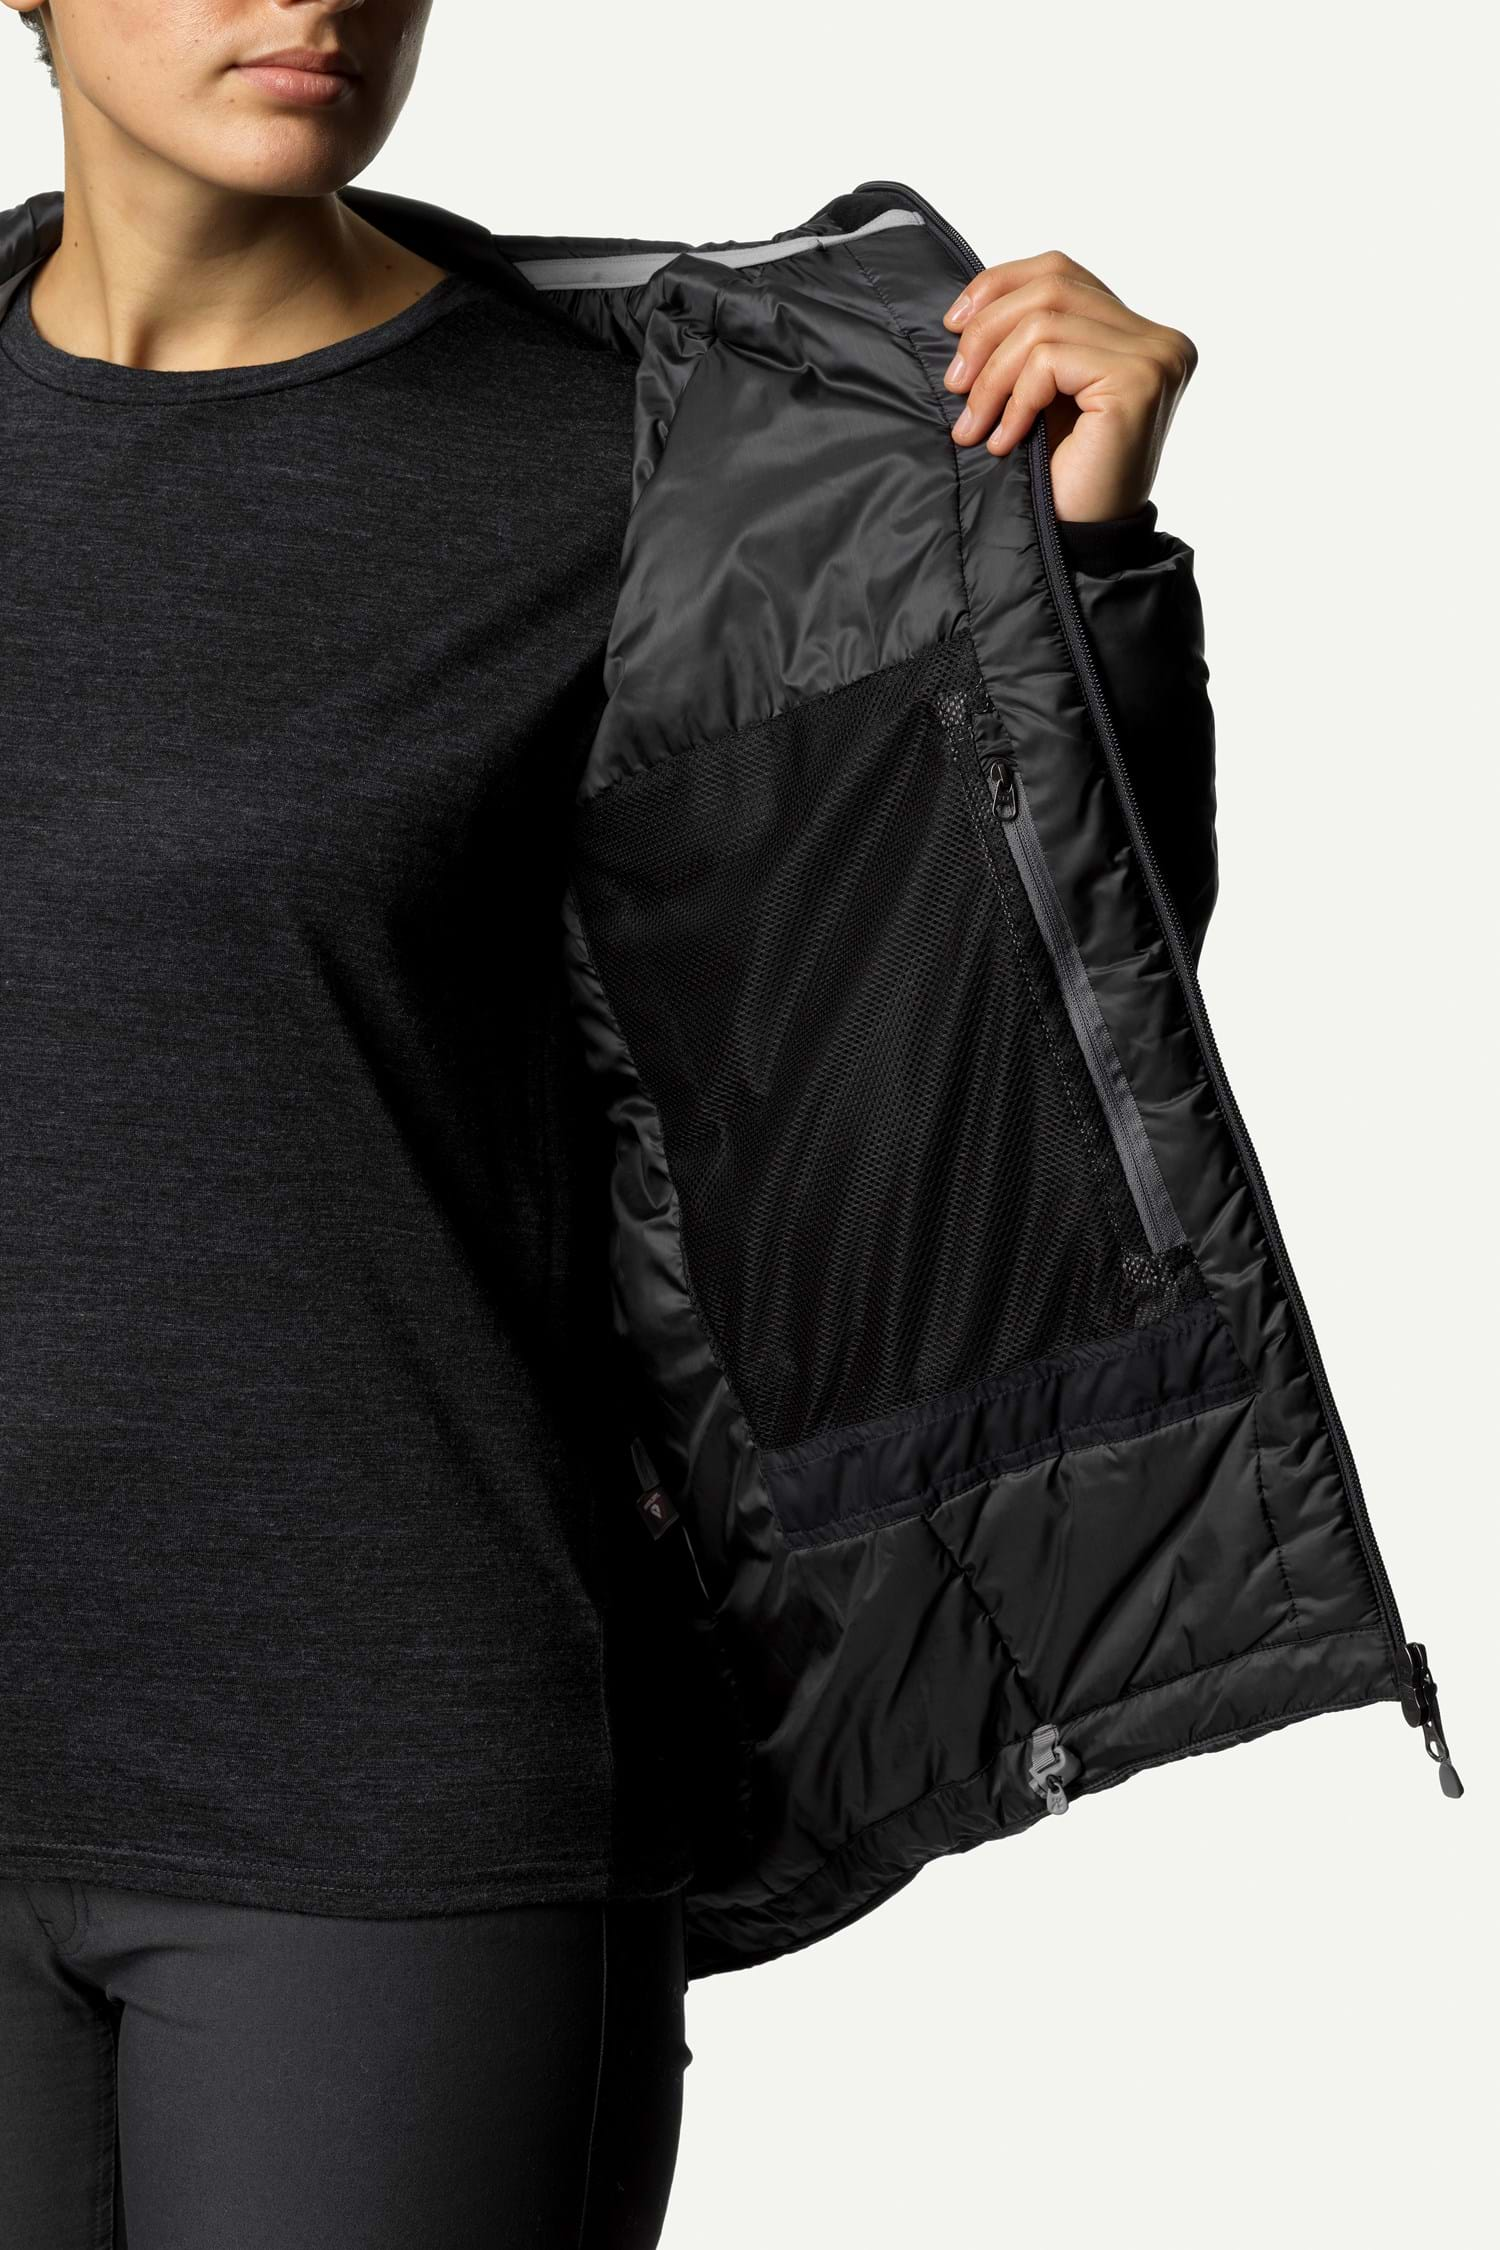 Mrs Dunfri | Houdini Sportswear